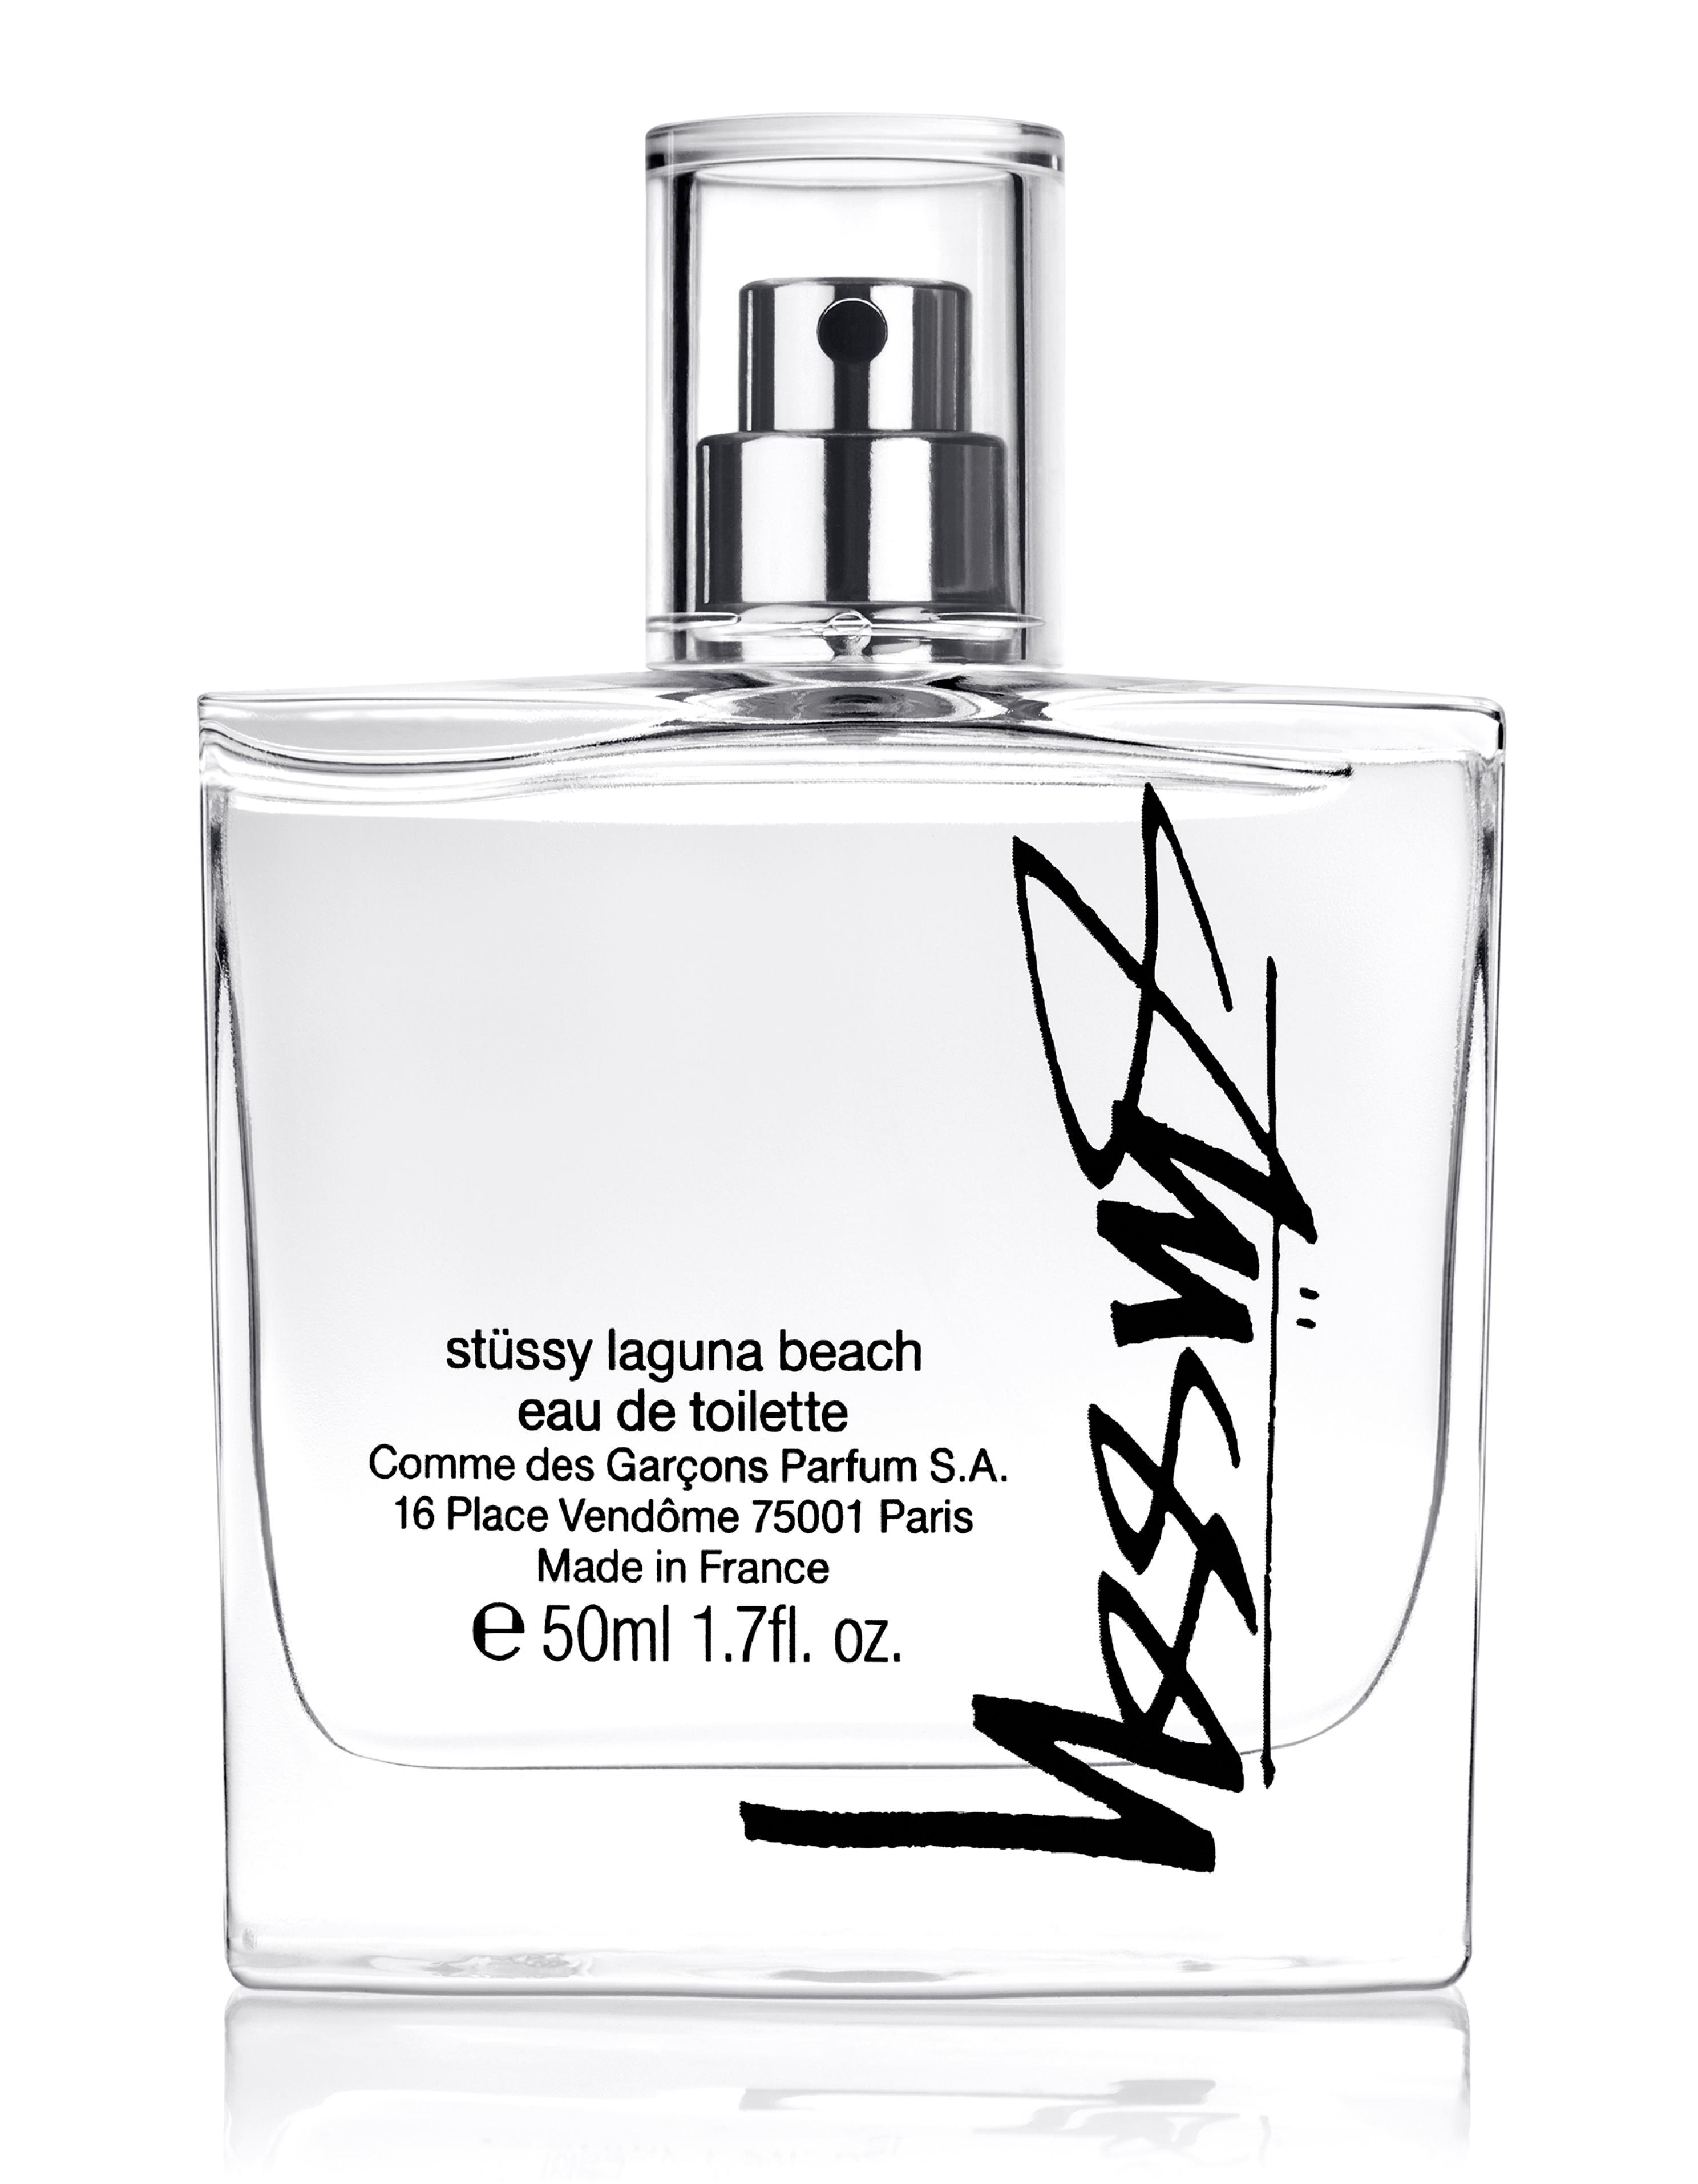 StussyCDG Parfums20210205_01